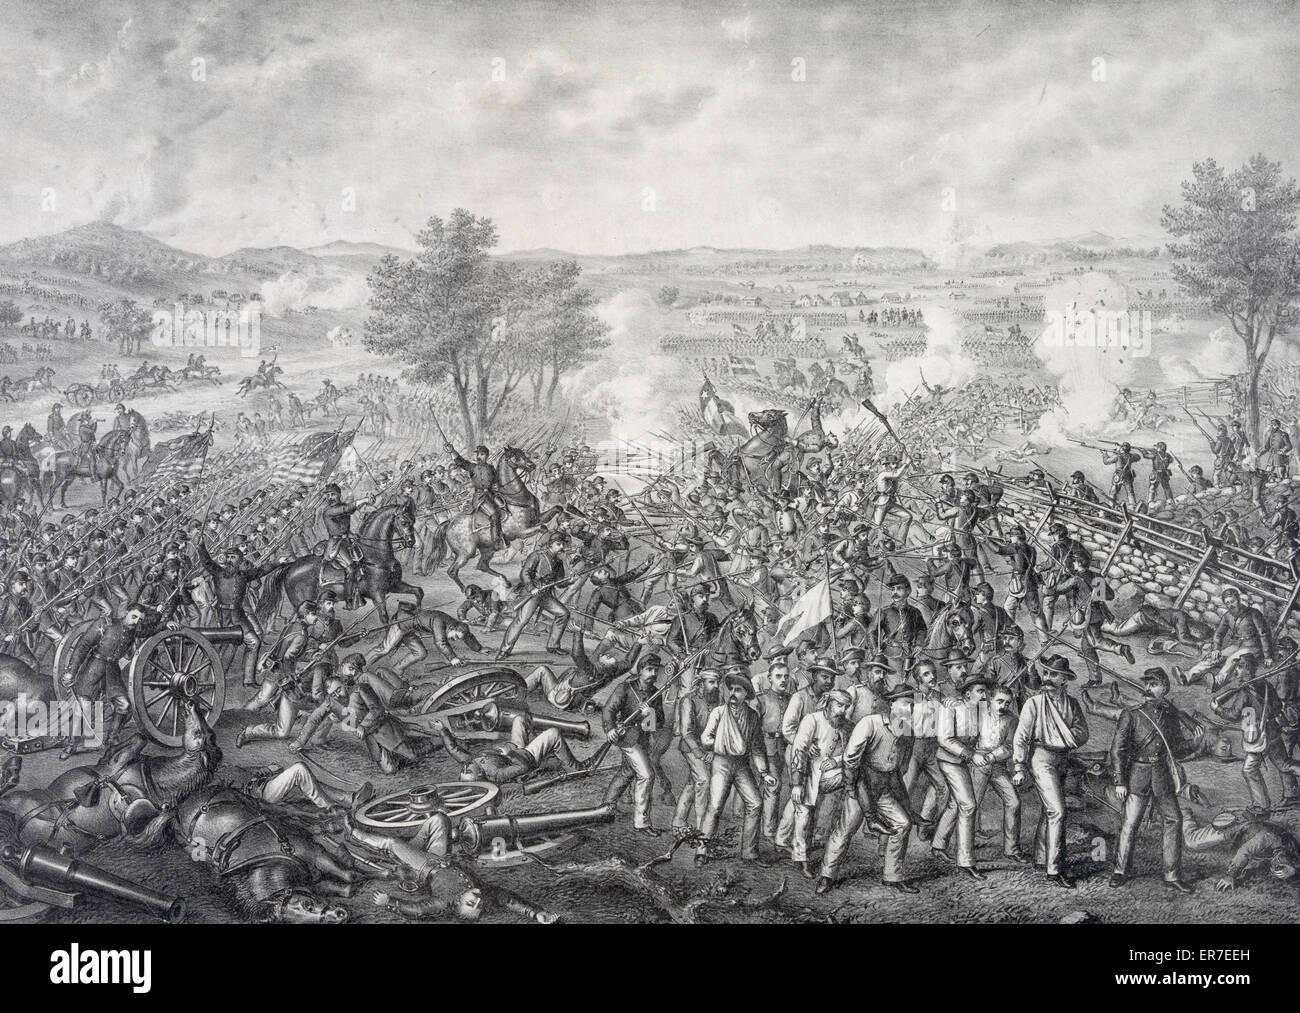 Gettysburg dating